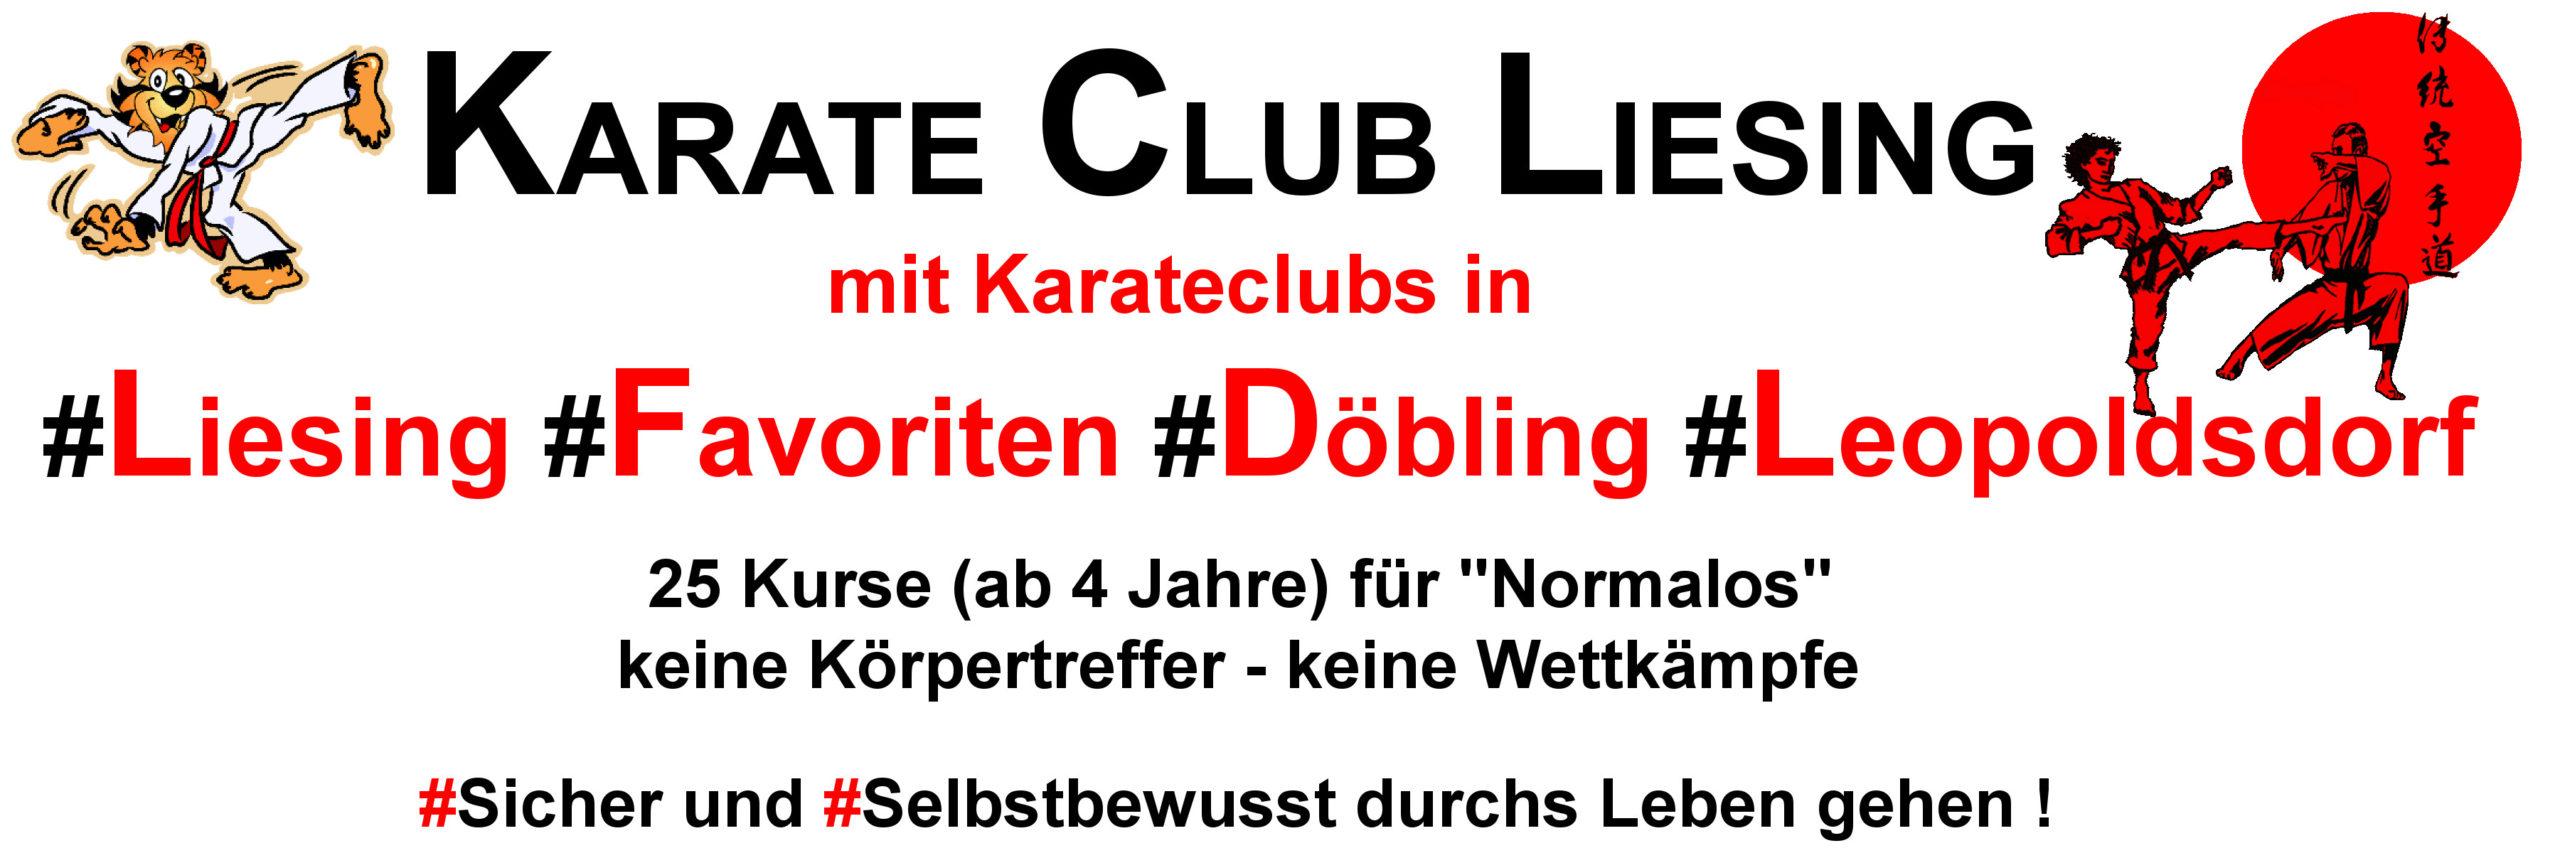 Karateclub Liesing